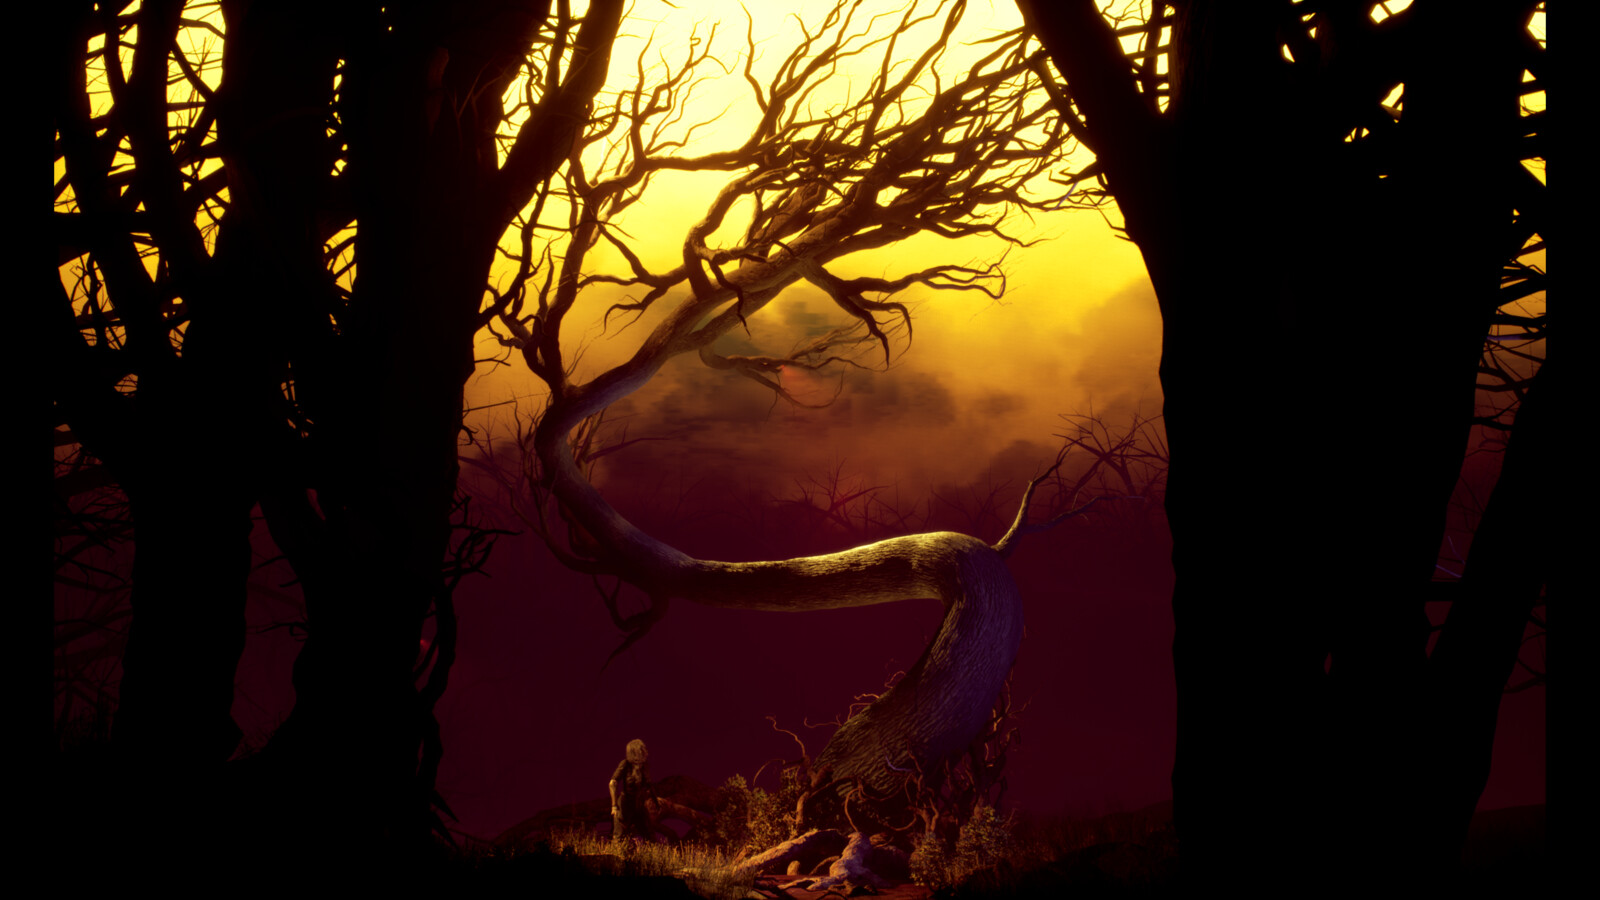 UE5: The Winding Tree